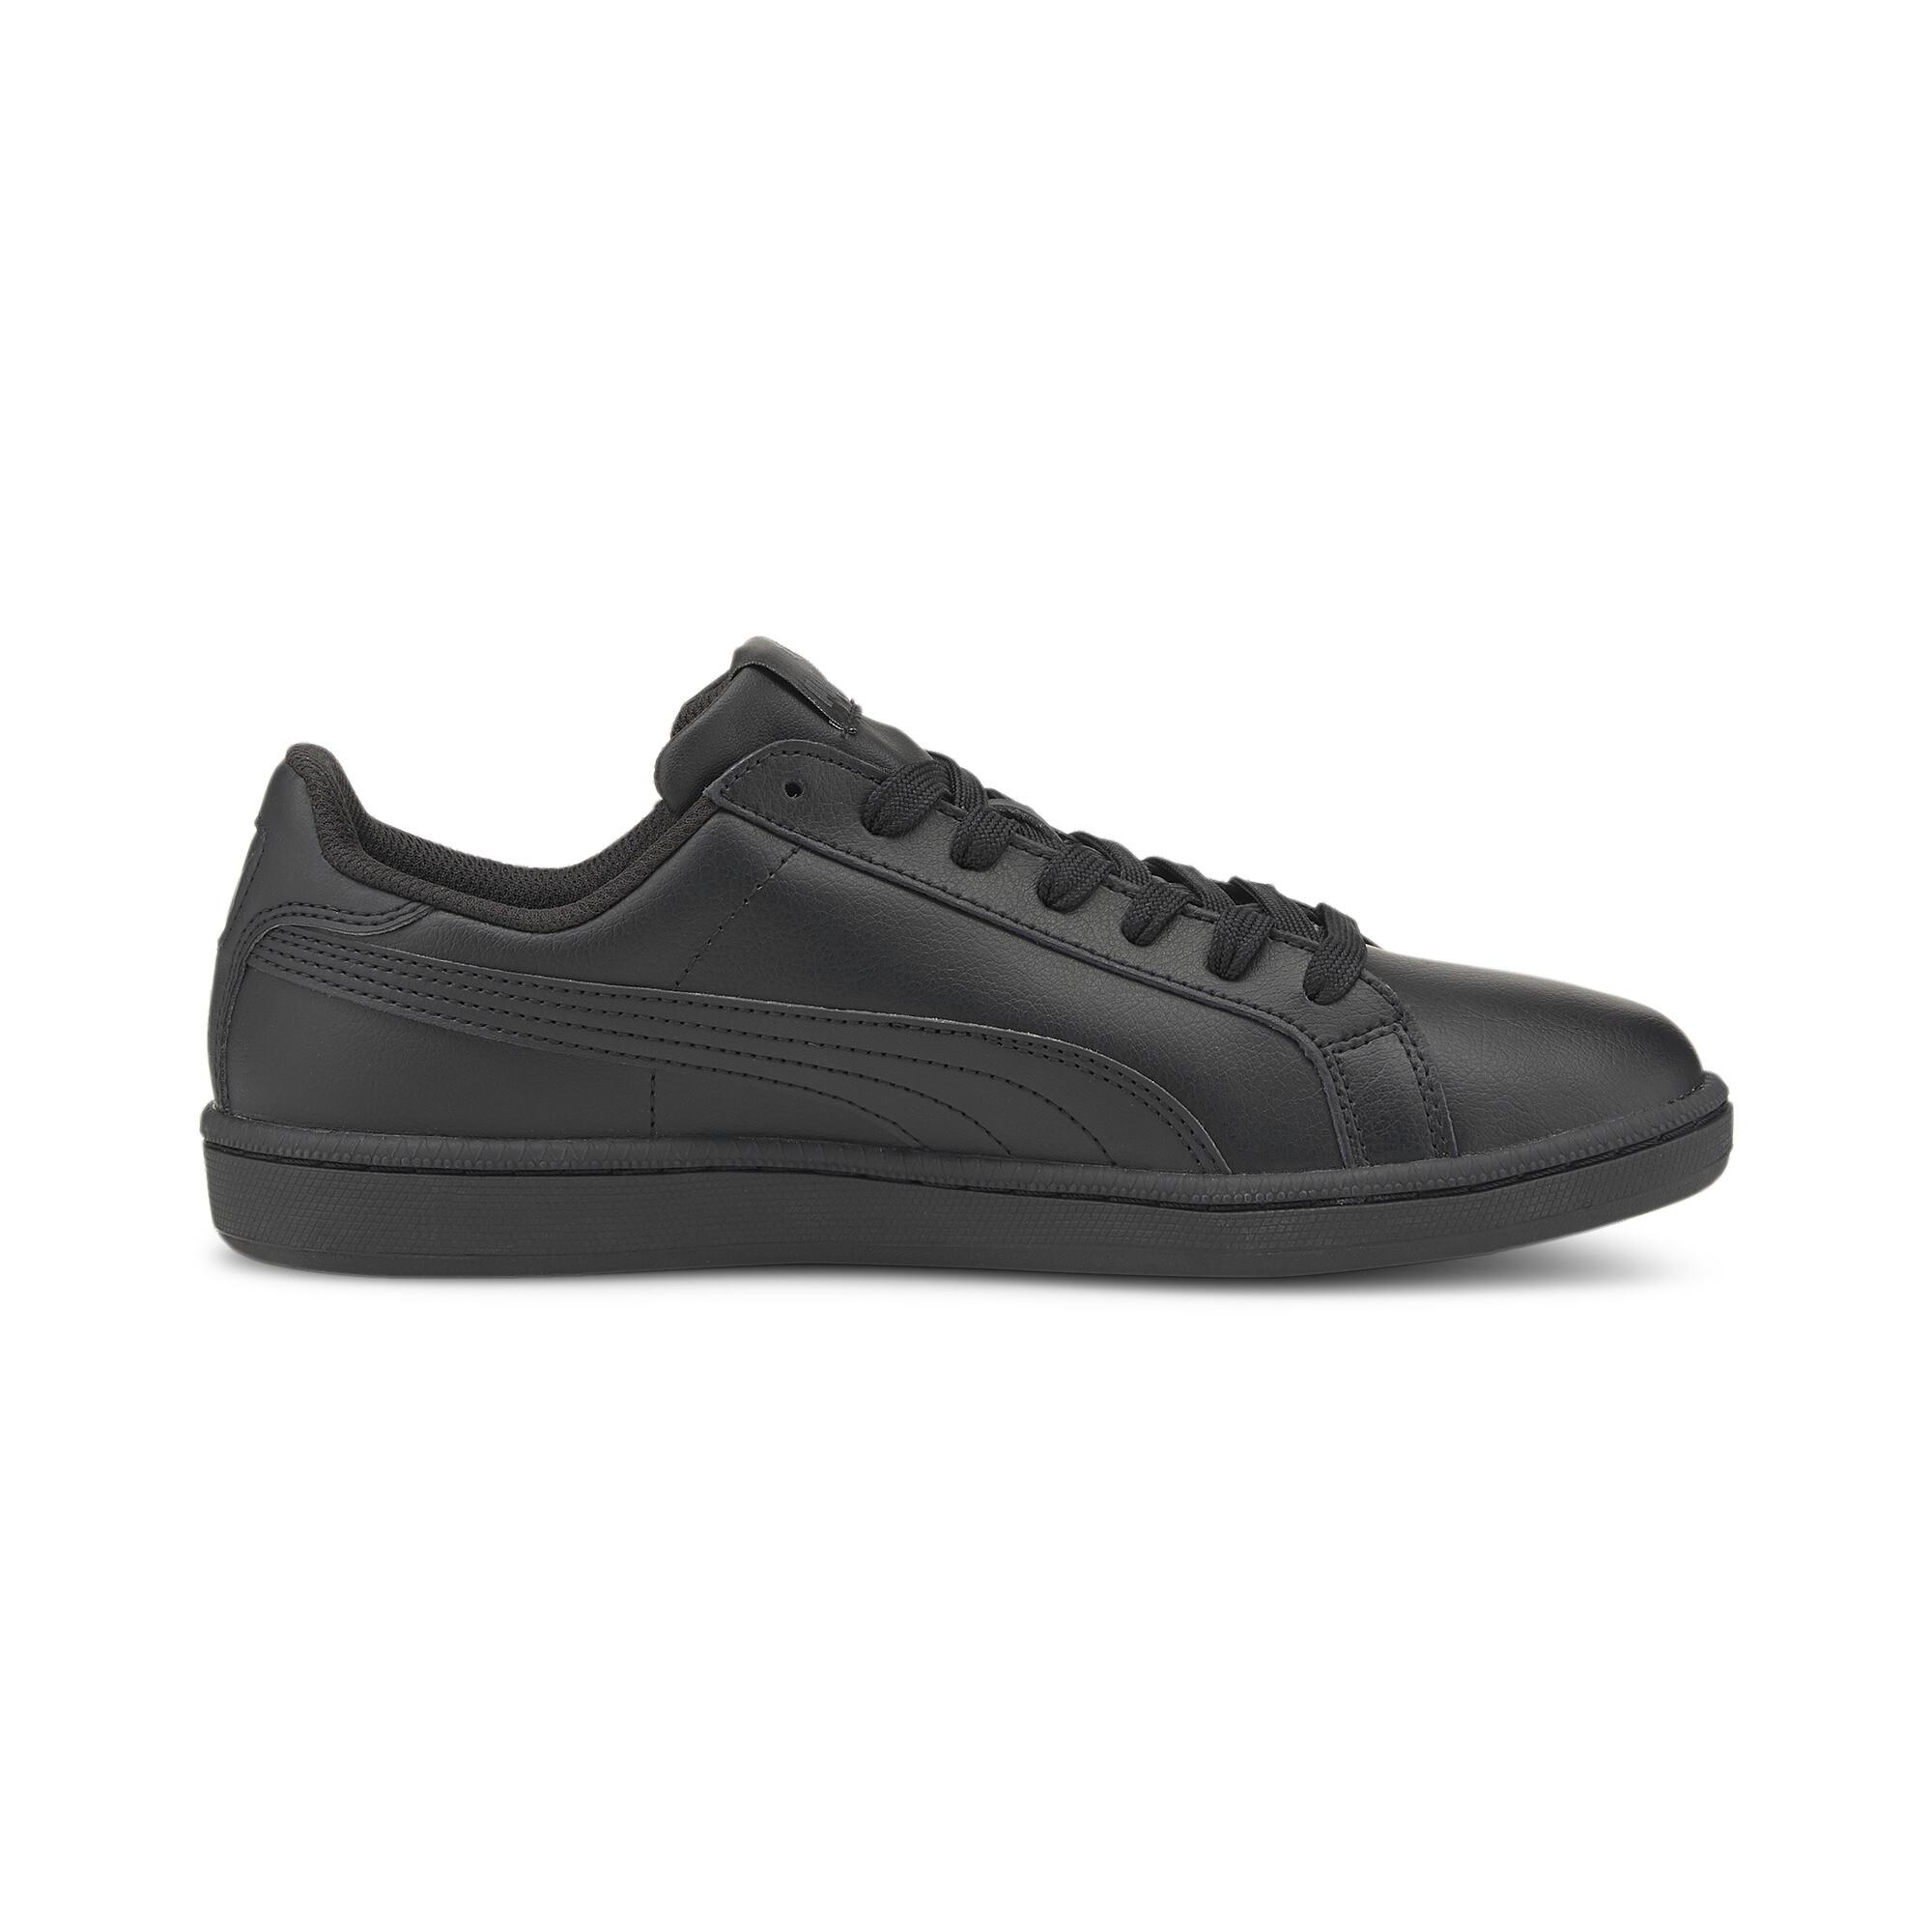 Indexbild 6 - PUMA Smash Trainers Schuhe Sneakers Sport Classics Unisex Neu